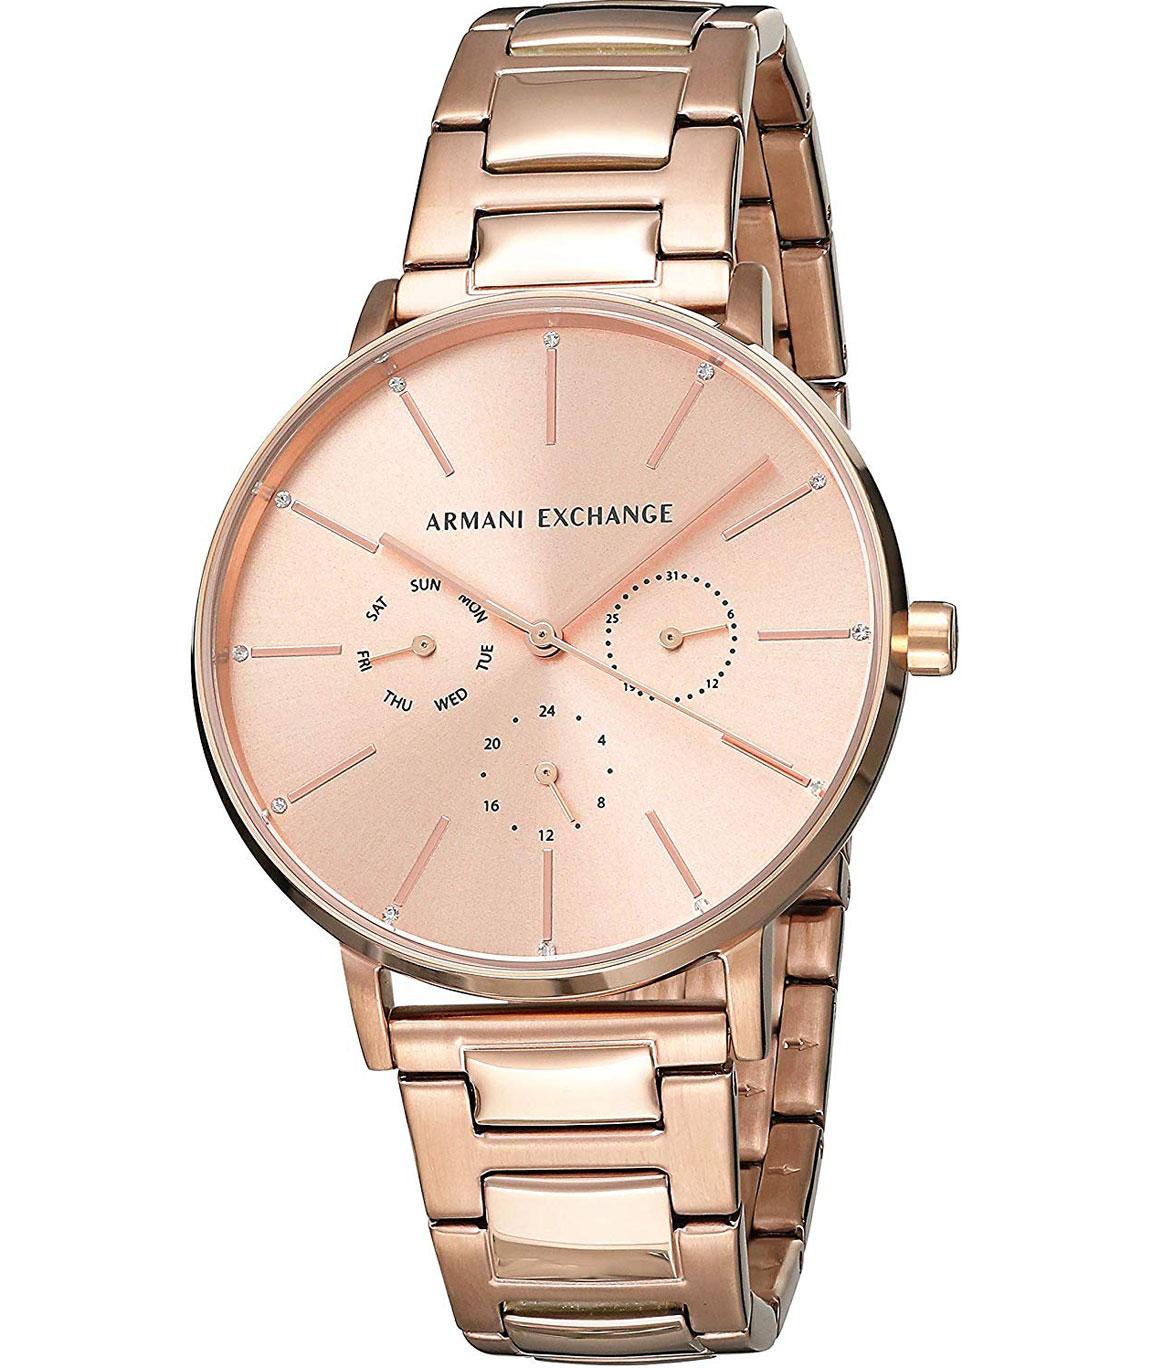 Armani Exchange Lola Analog Gold Dial Women`s Watch